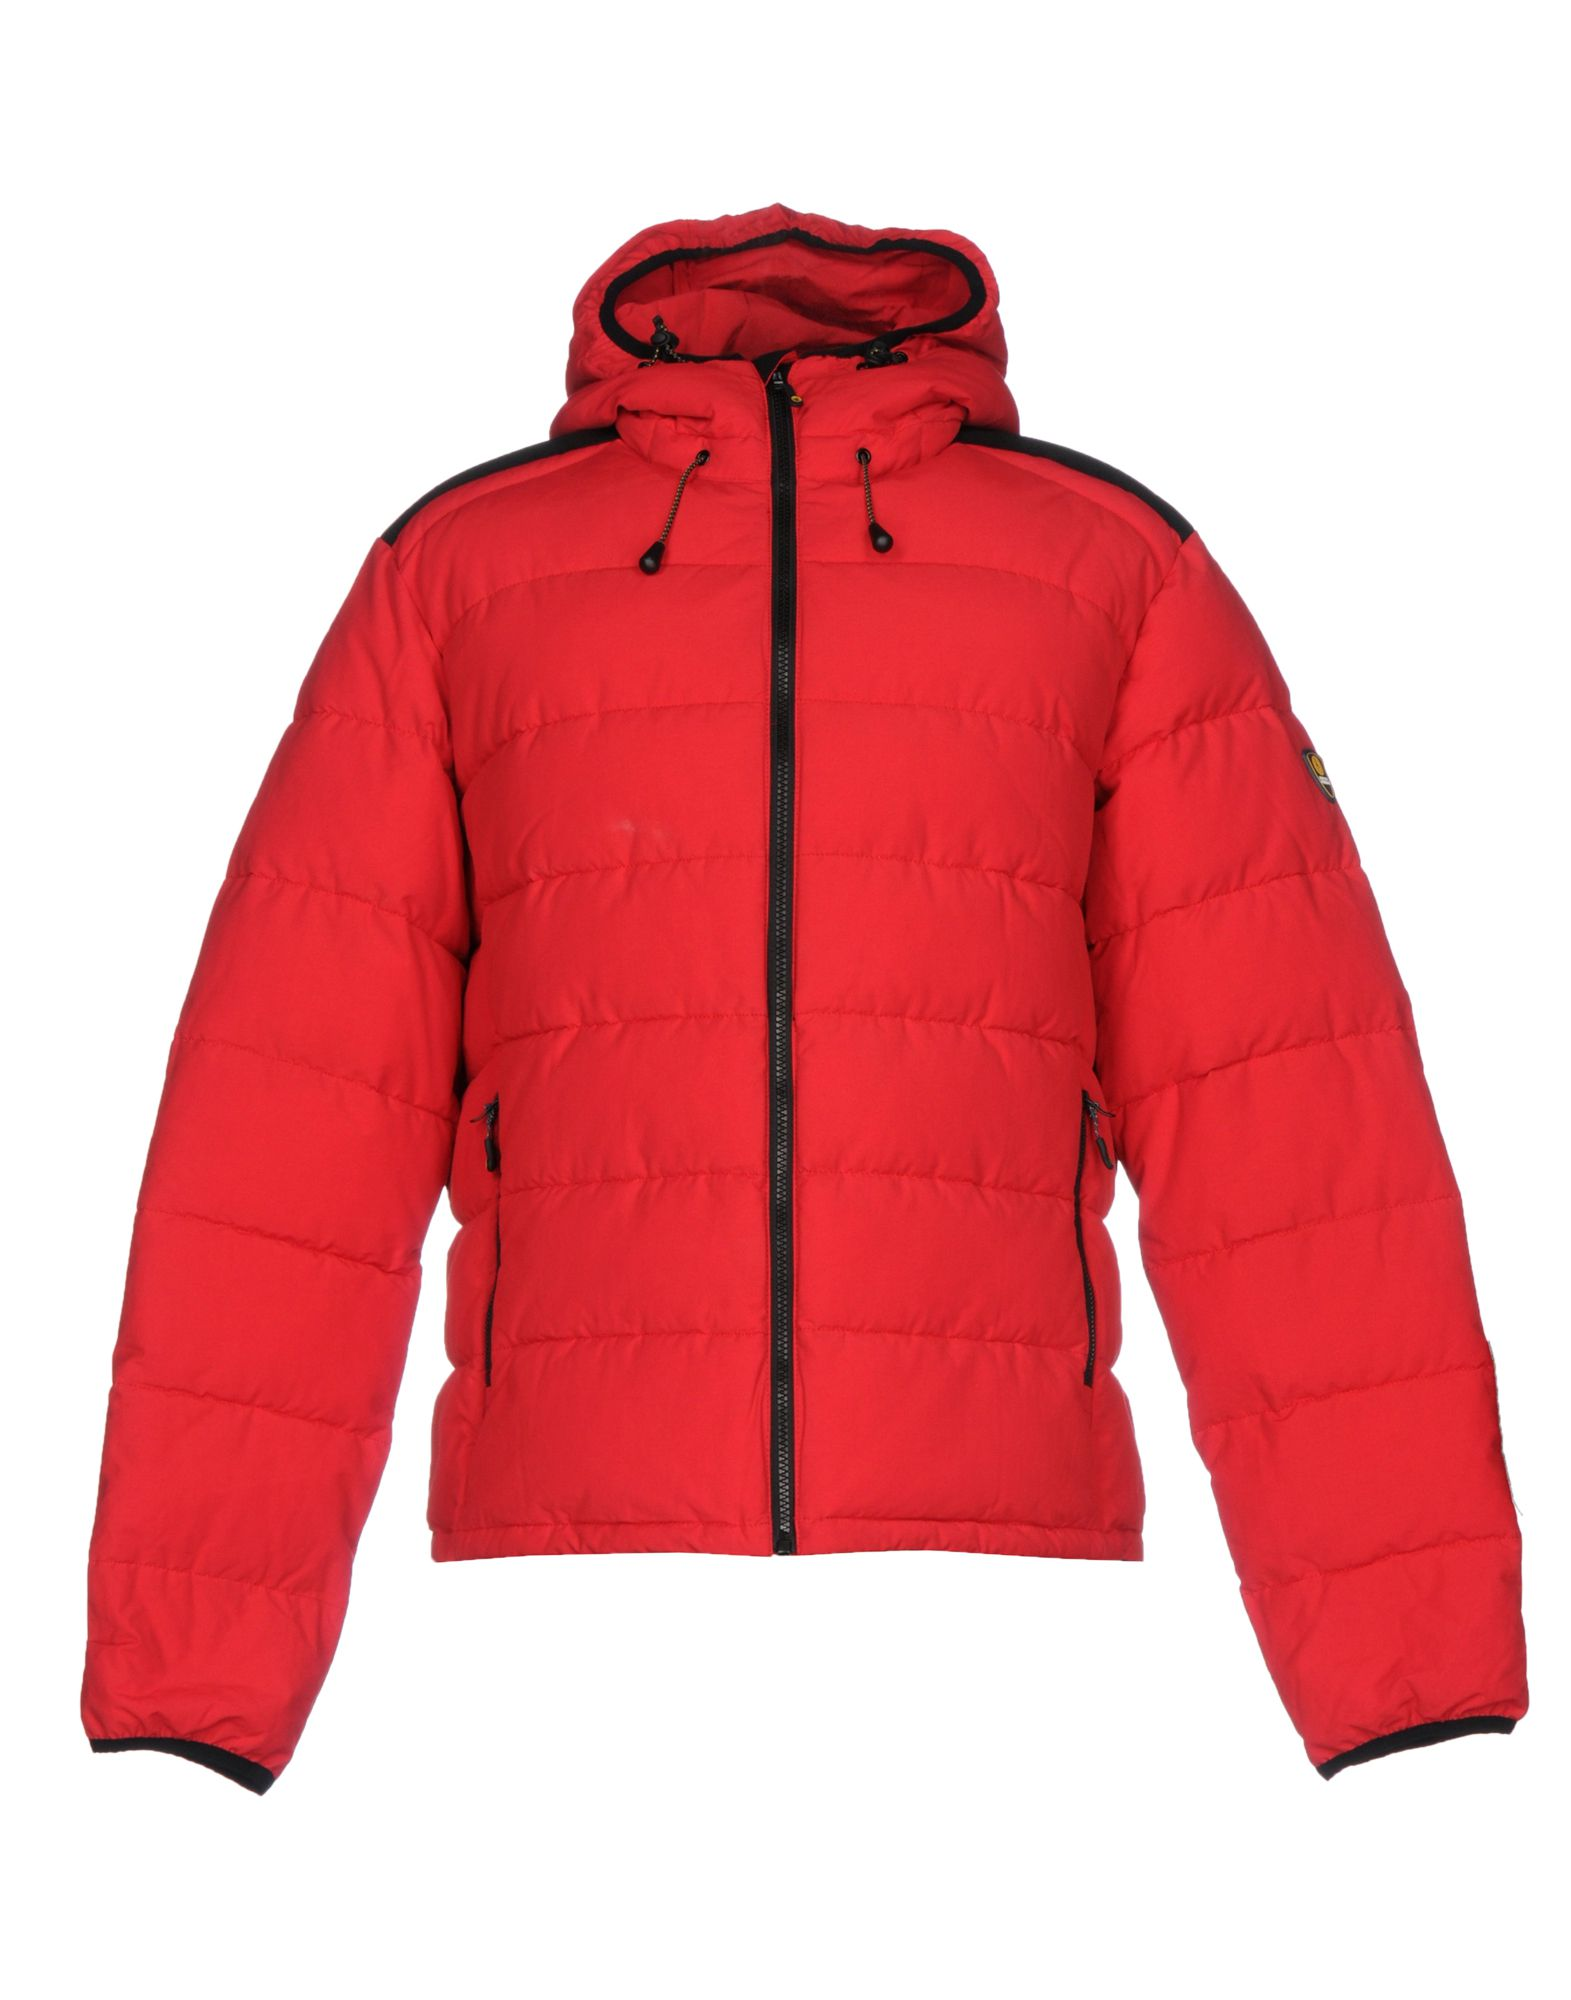 quality design faa9d a1c4e CIESSE PIUMINI Jacket - Coats & Jackets U   YOOX.COM